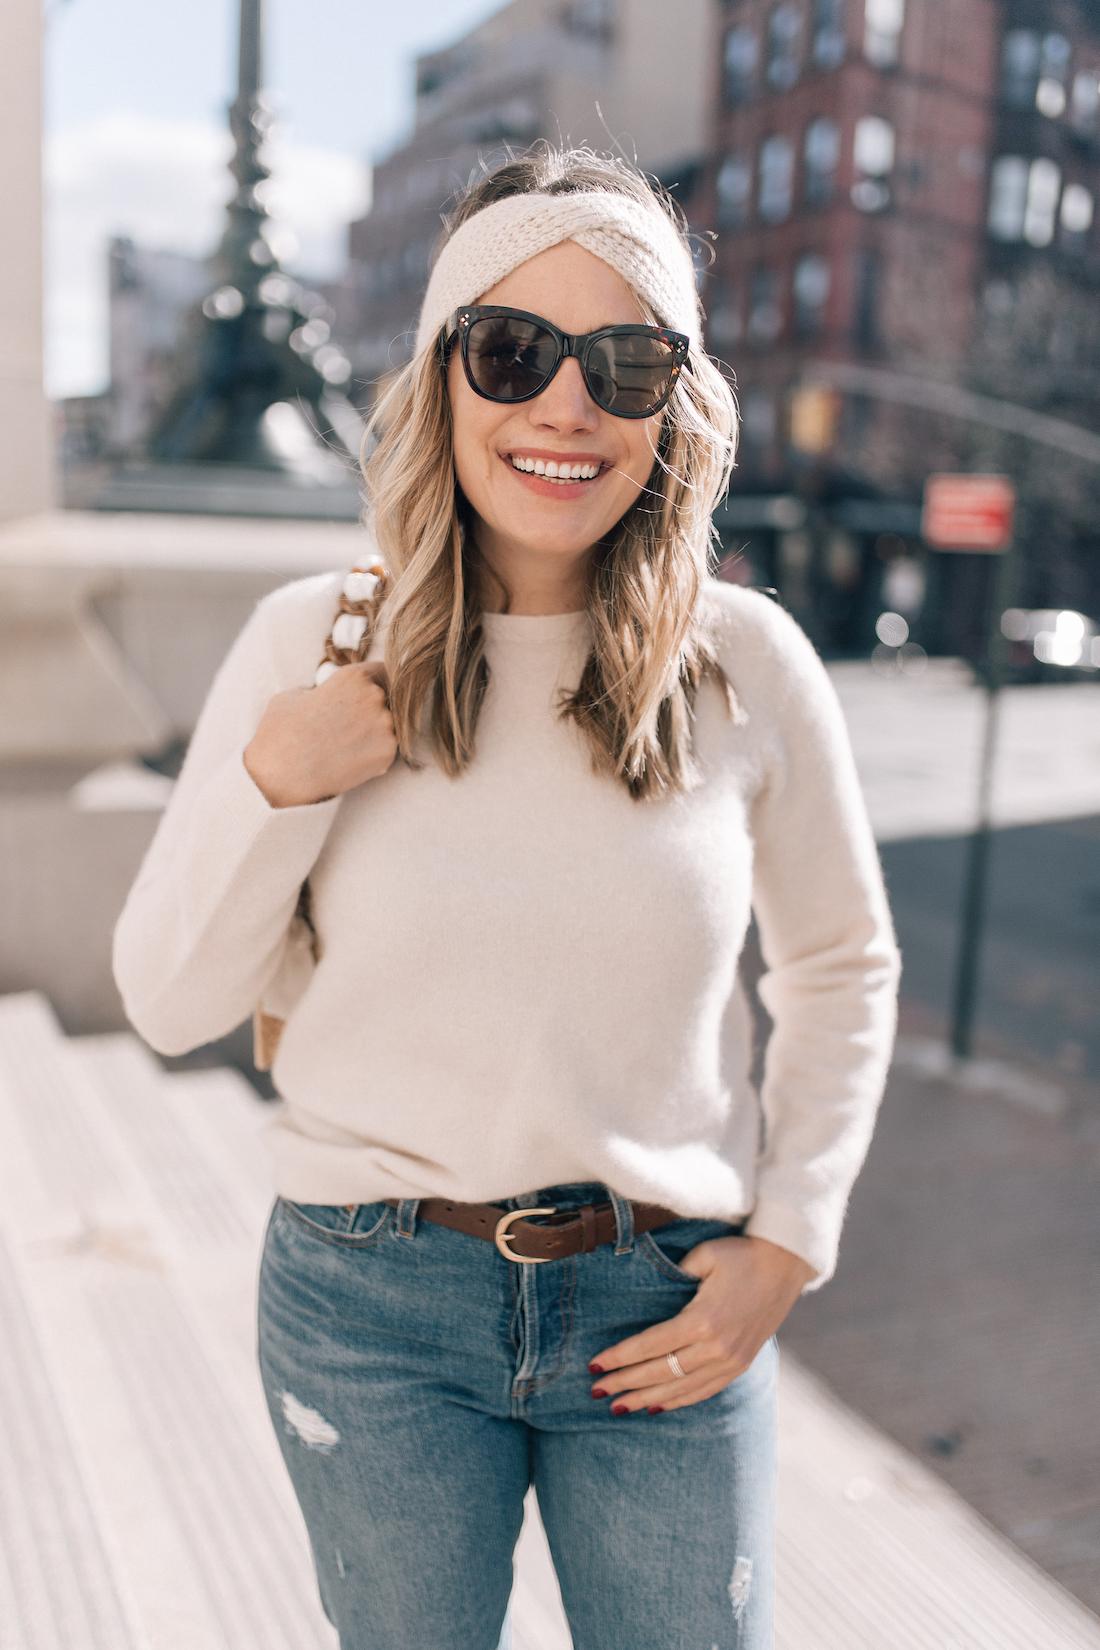 Outfit Details:Topshop Coat(exact) // Eileen Fisher Sweater(c/o) // Eileen Fisher Headband (c/o)// Levi's Jeans // Polaroid Sunglasses // J.Crew Belt